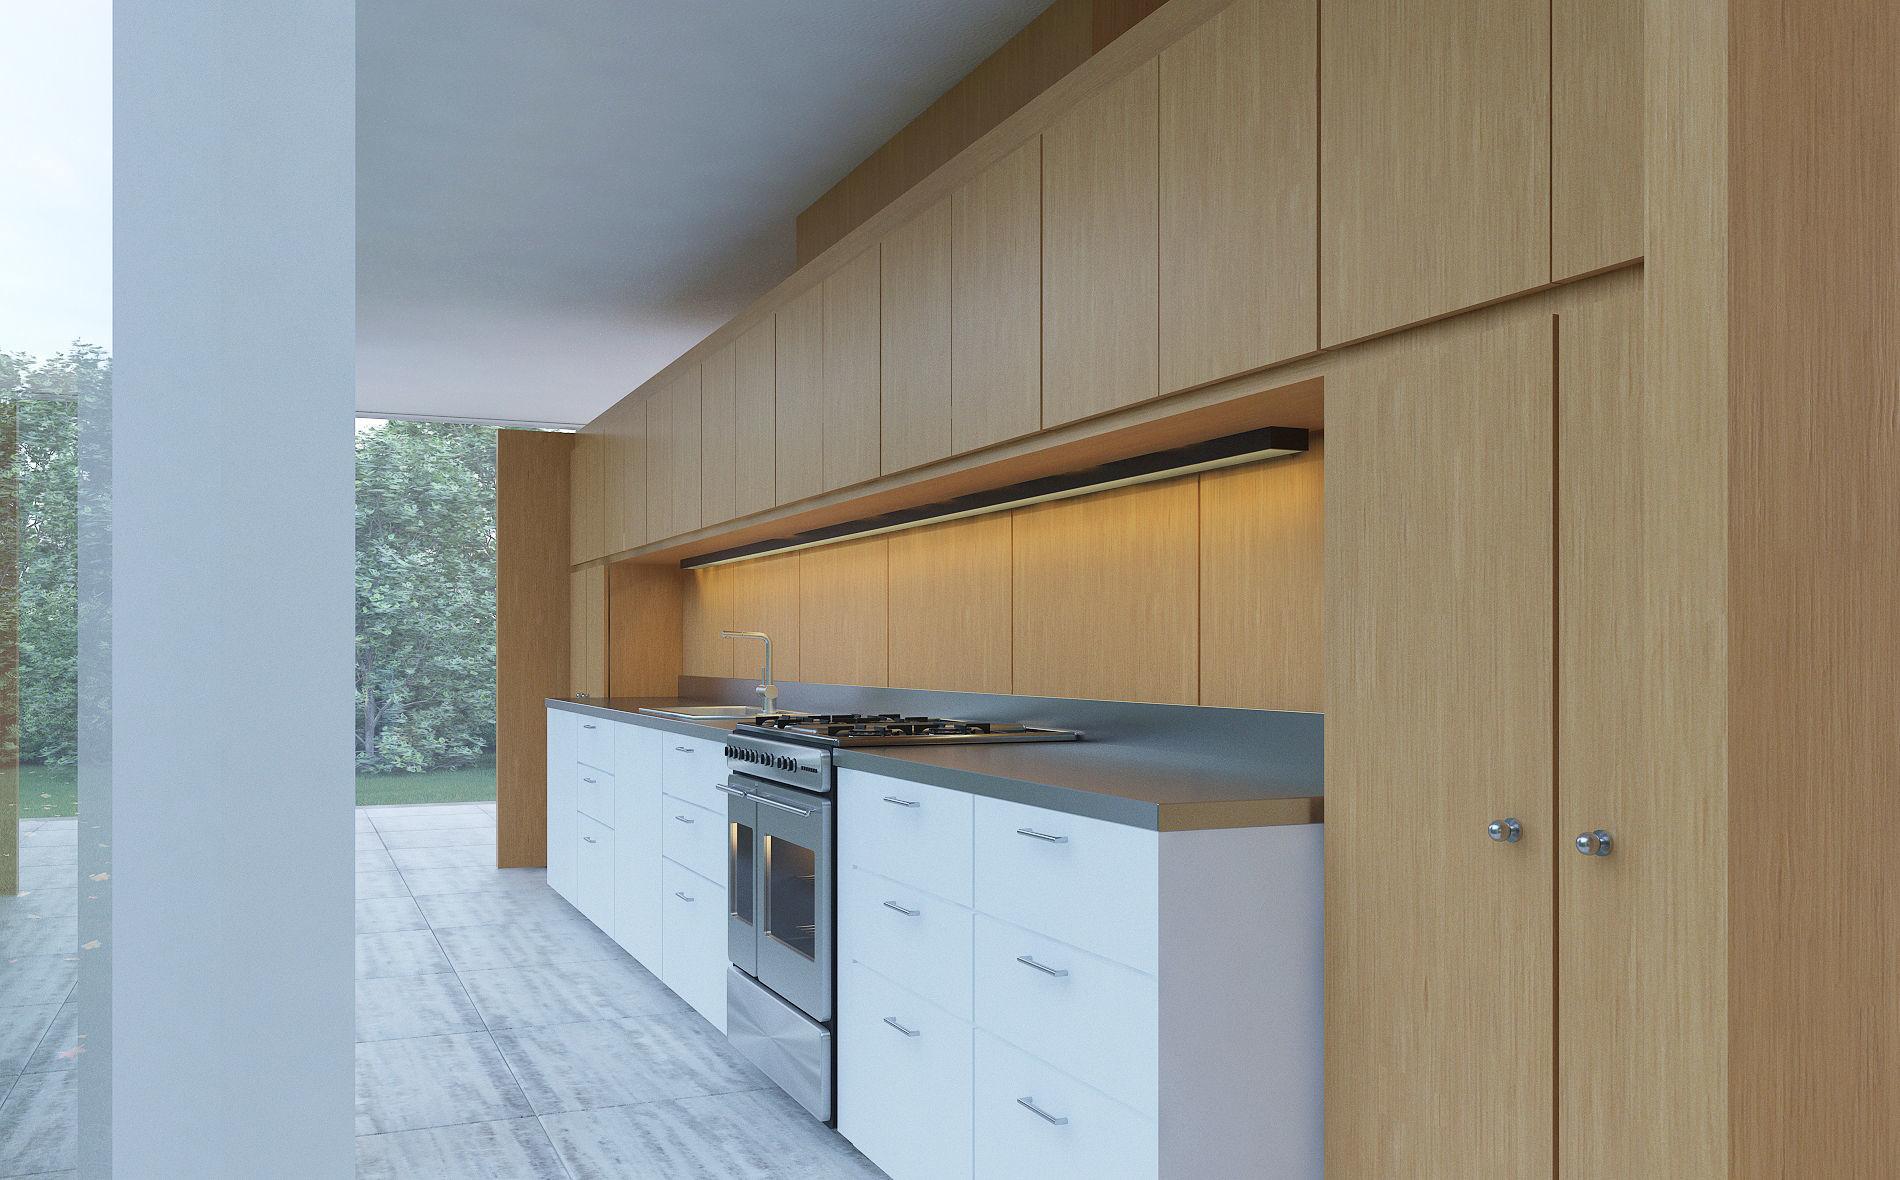 Farnsworth House Kitchen